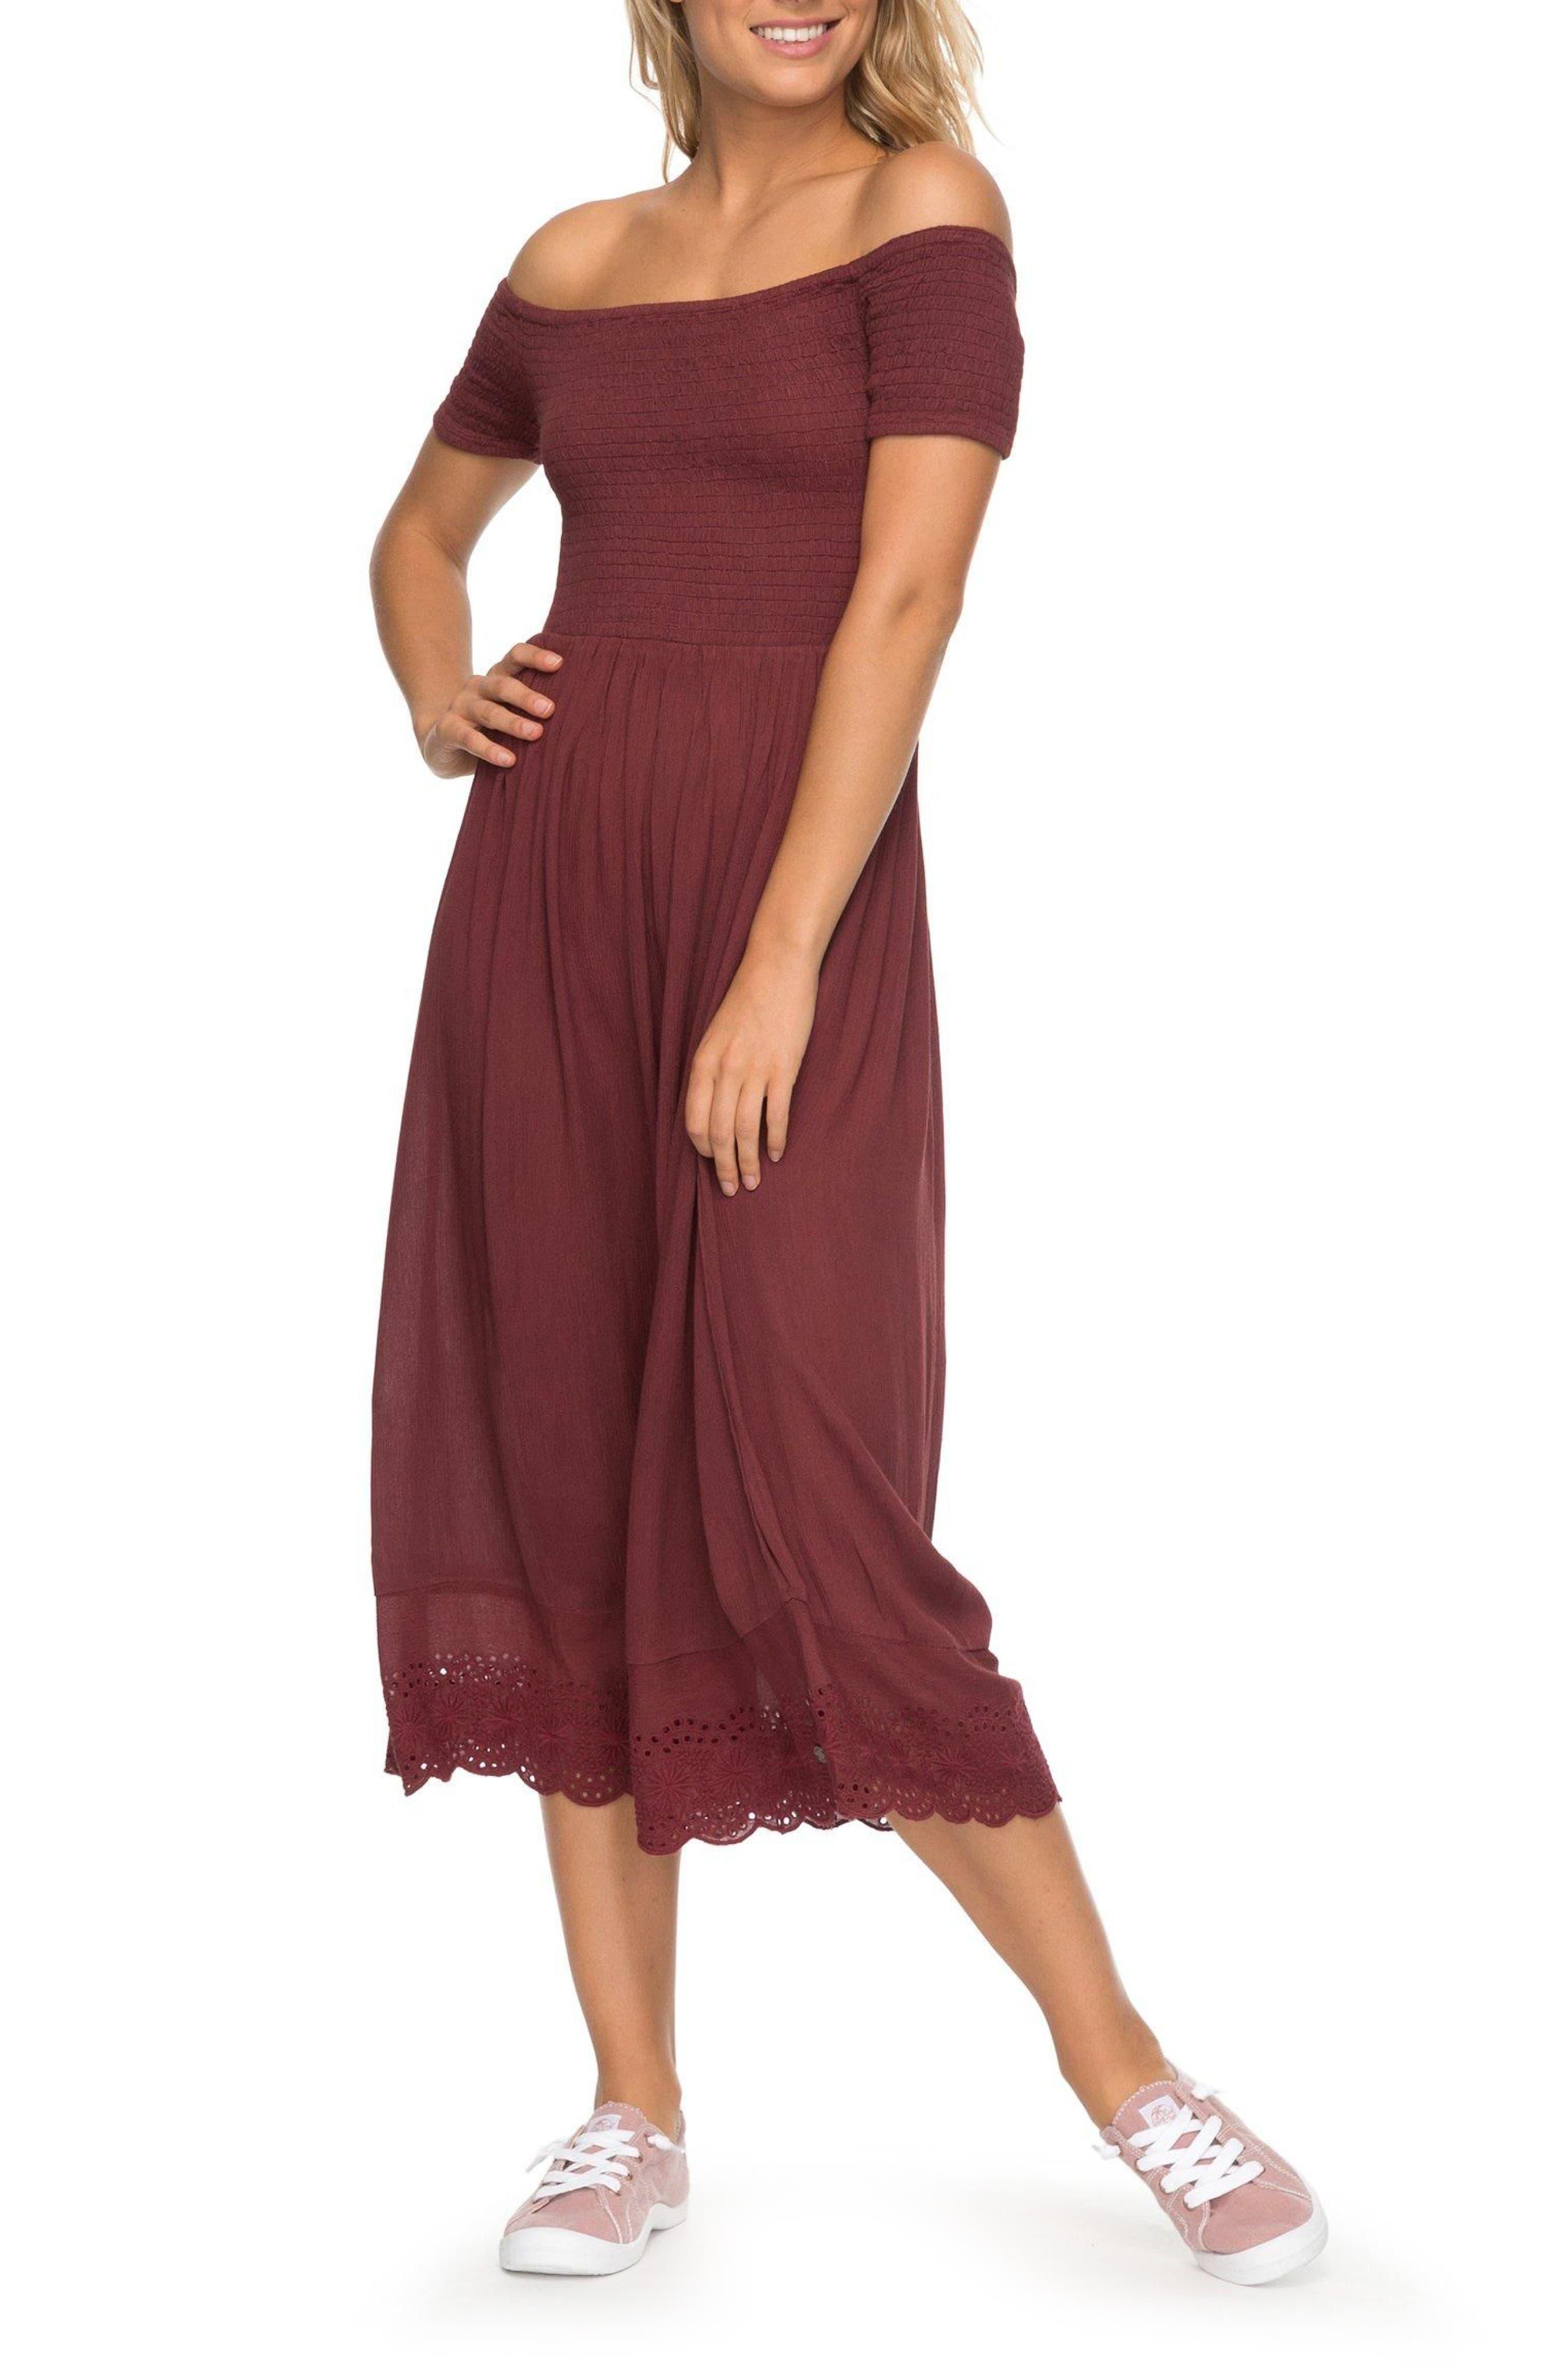 Main Image - Roxy Pretty Lovers Off the Shoulder Midi Dress